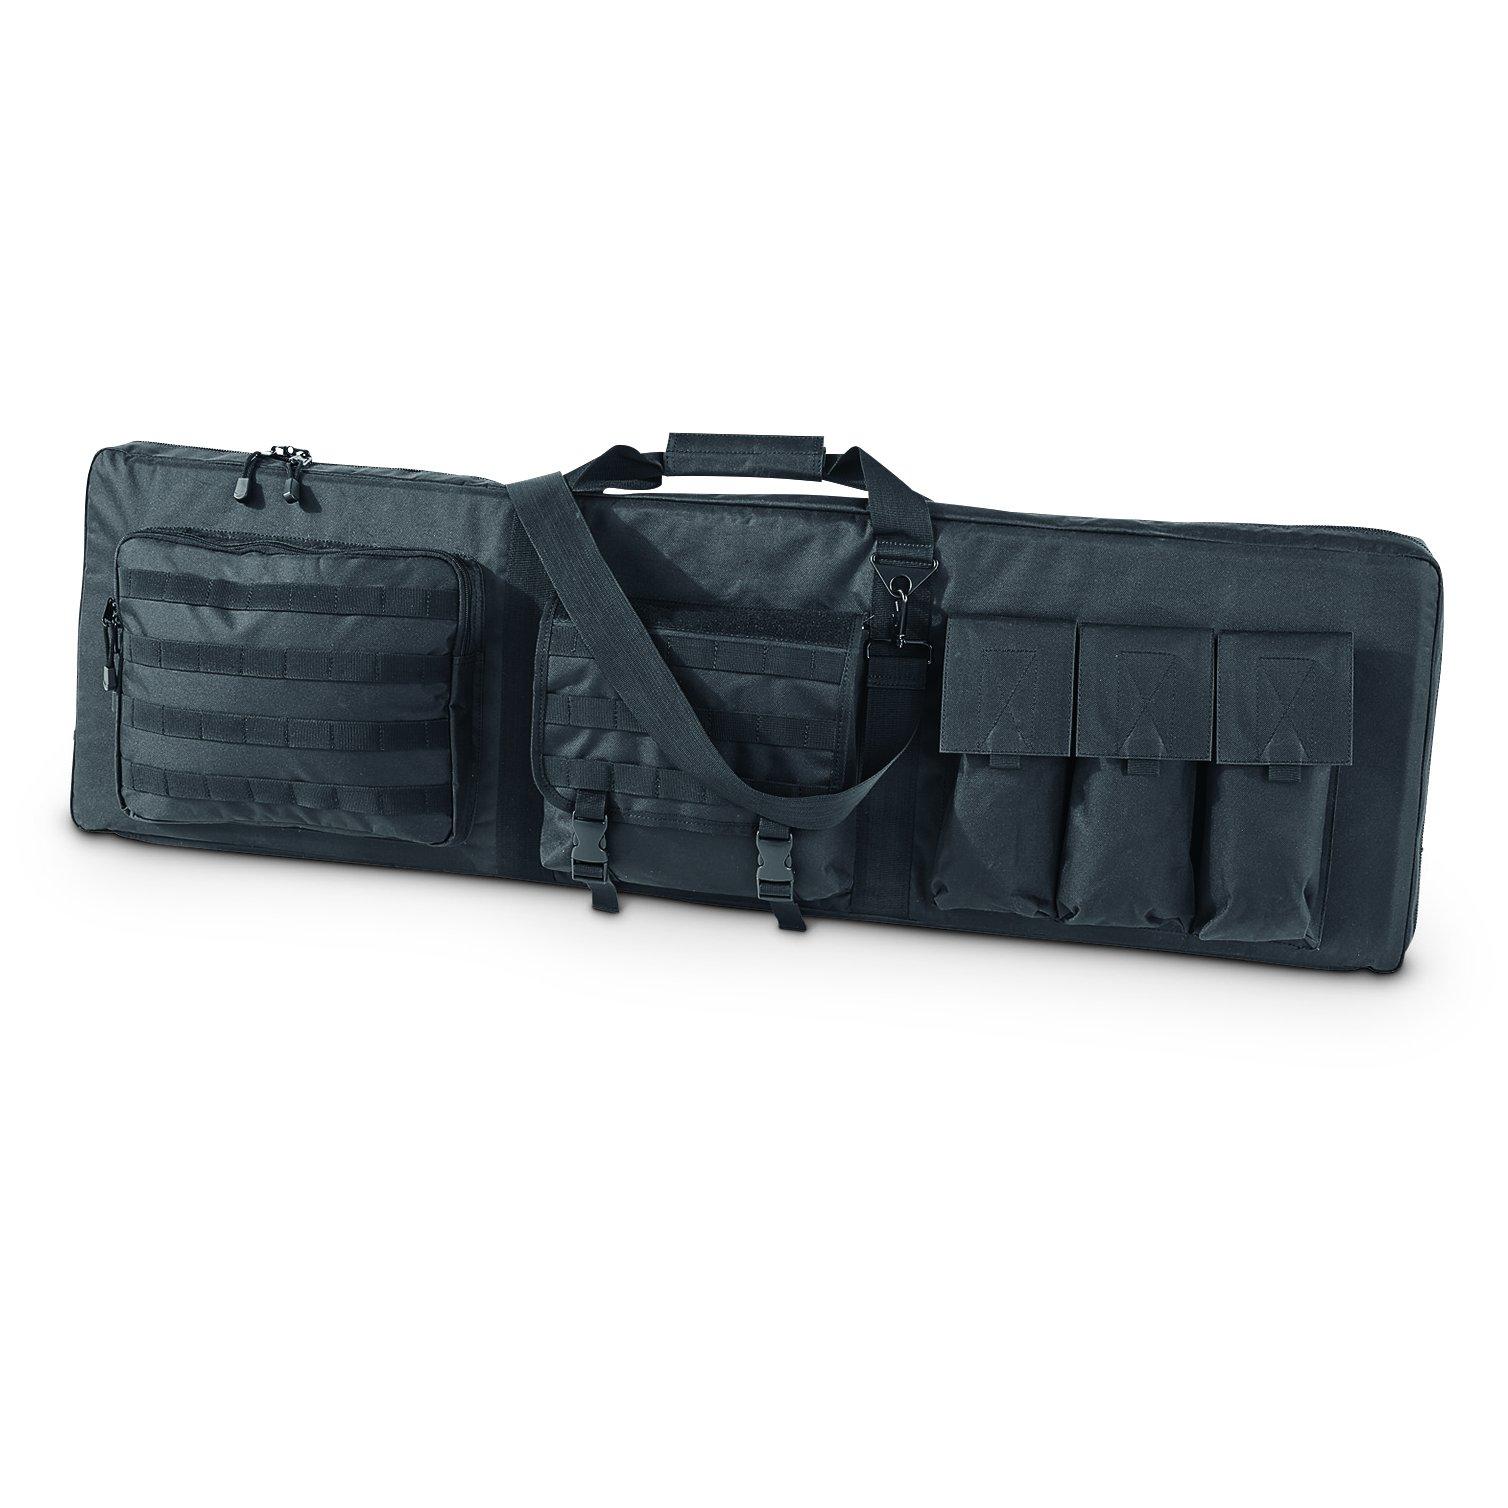 Rifle Case Holds 3 Rifles 2 Handguns & 6 Magazines, 52''